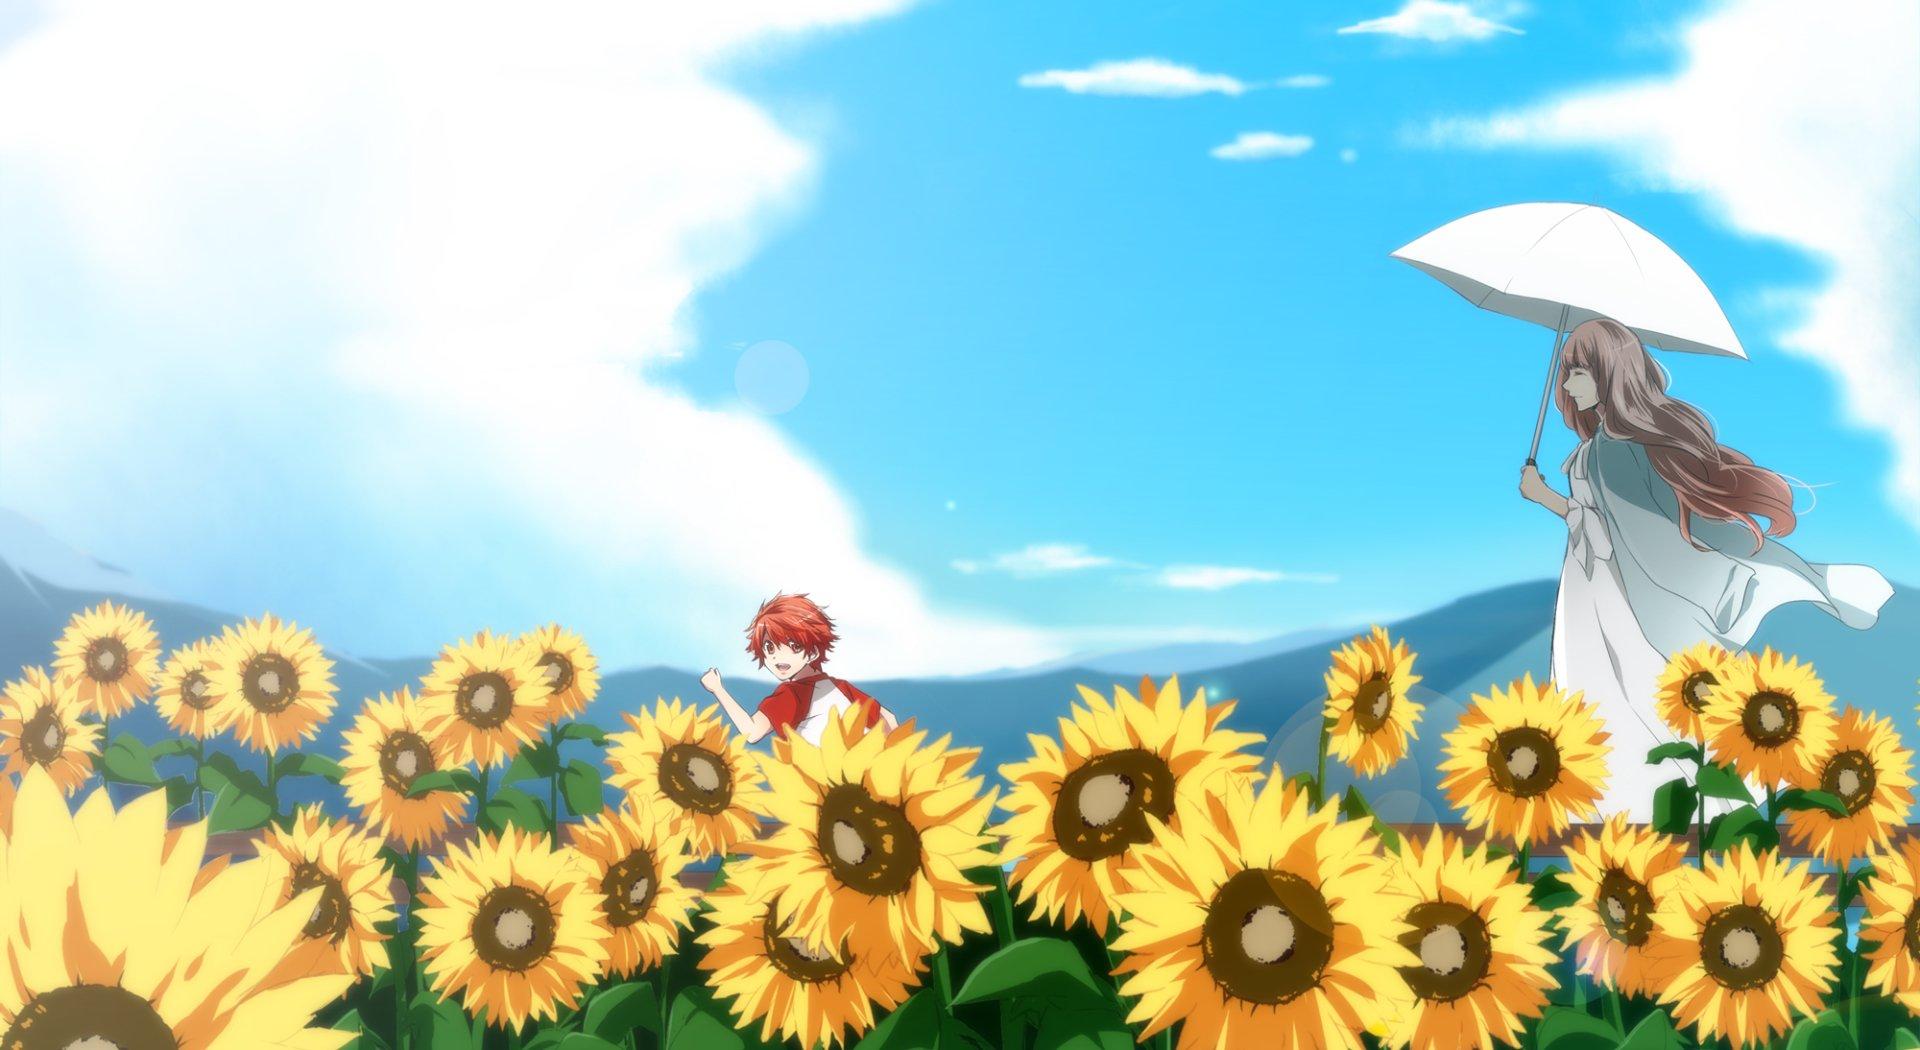 Anime - Uta No Prince-sama  Ittoki Otoya Wallpaper